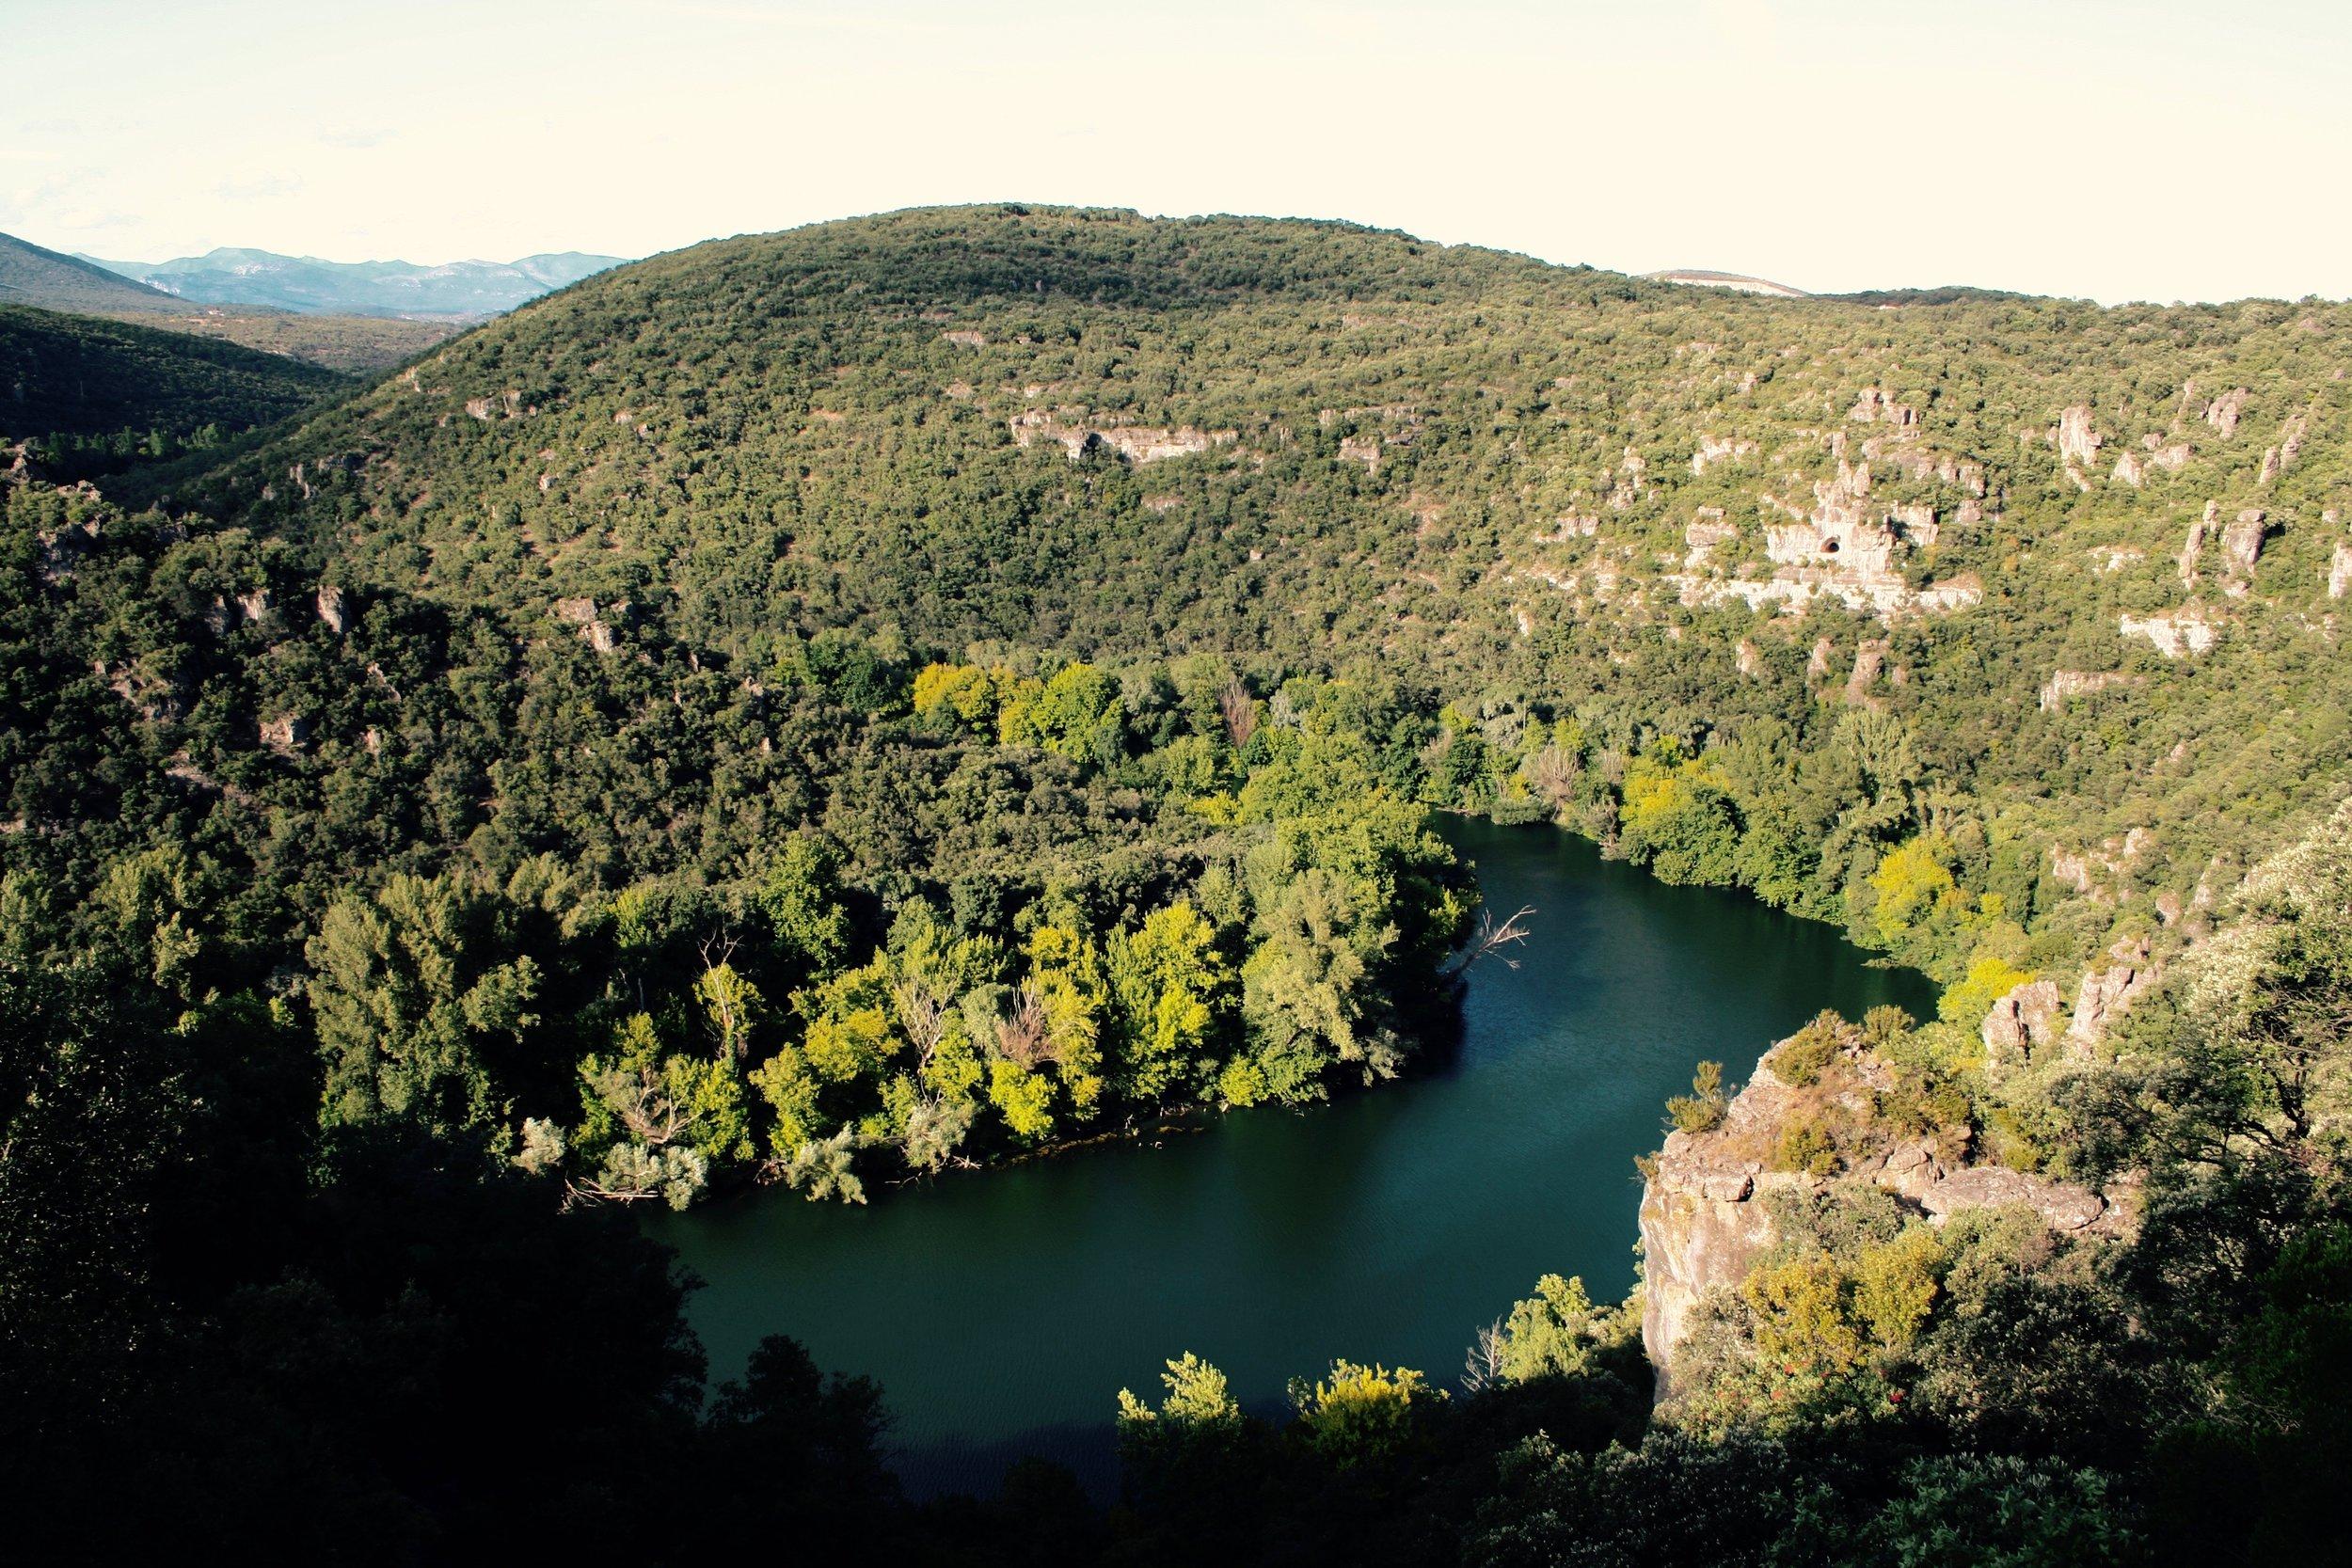 BIKE TOUR 3 - The Hérault River and Medieval Villages